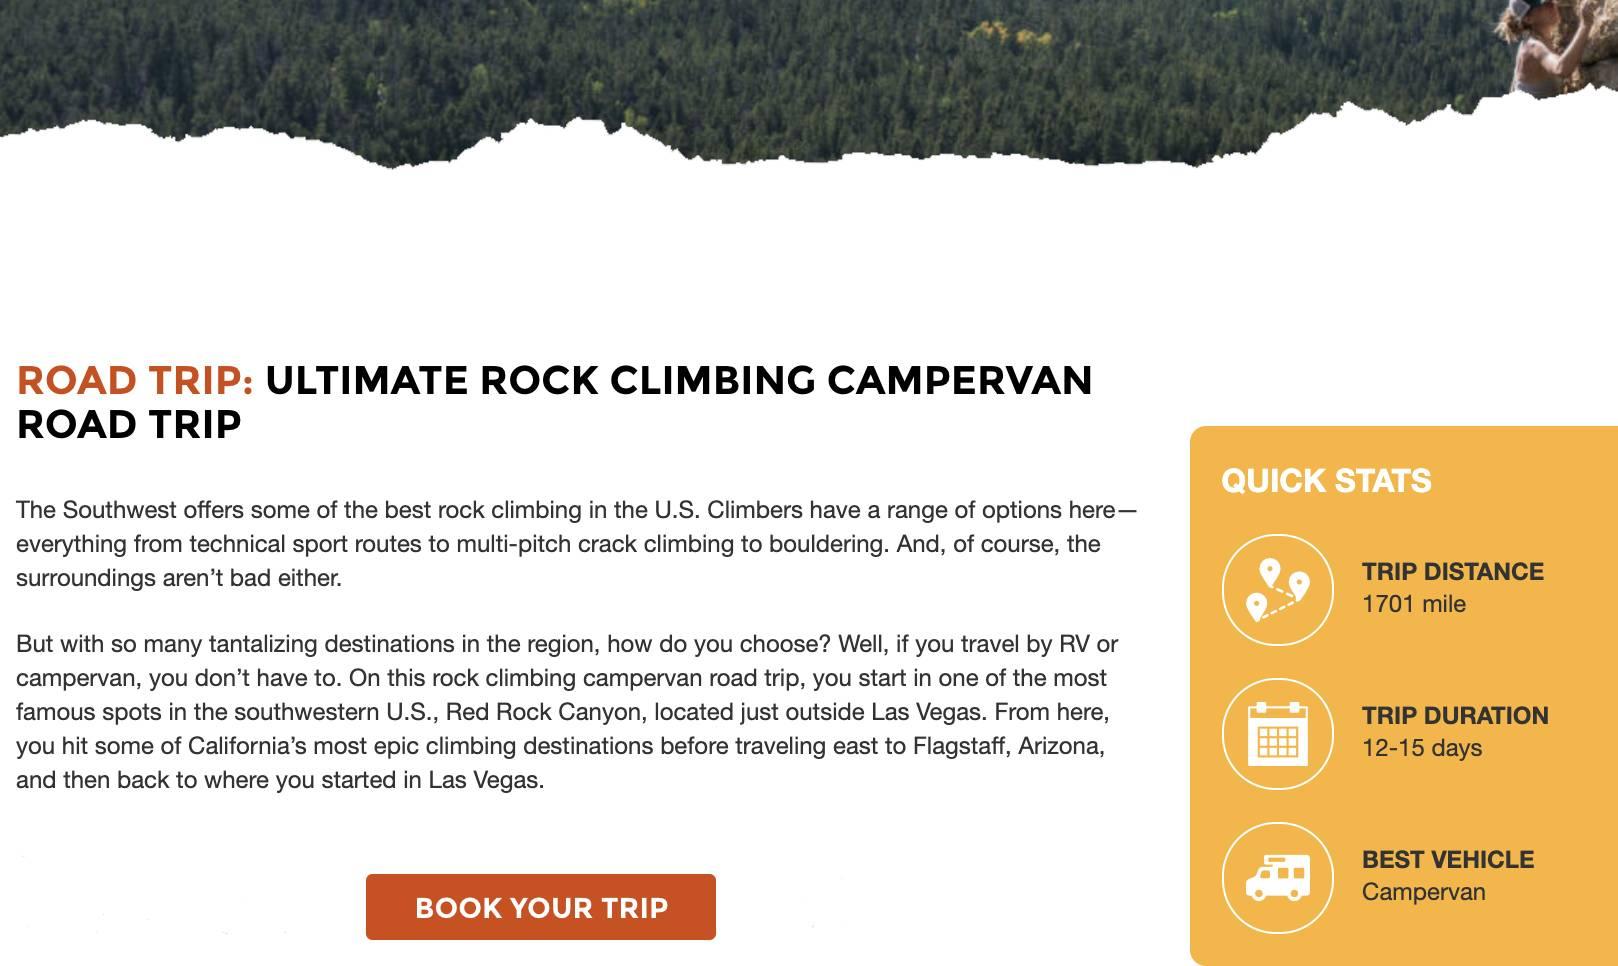 a webpage describing a week-long Travellers Autobarn Kuga Campervan itinerary